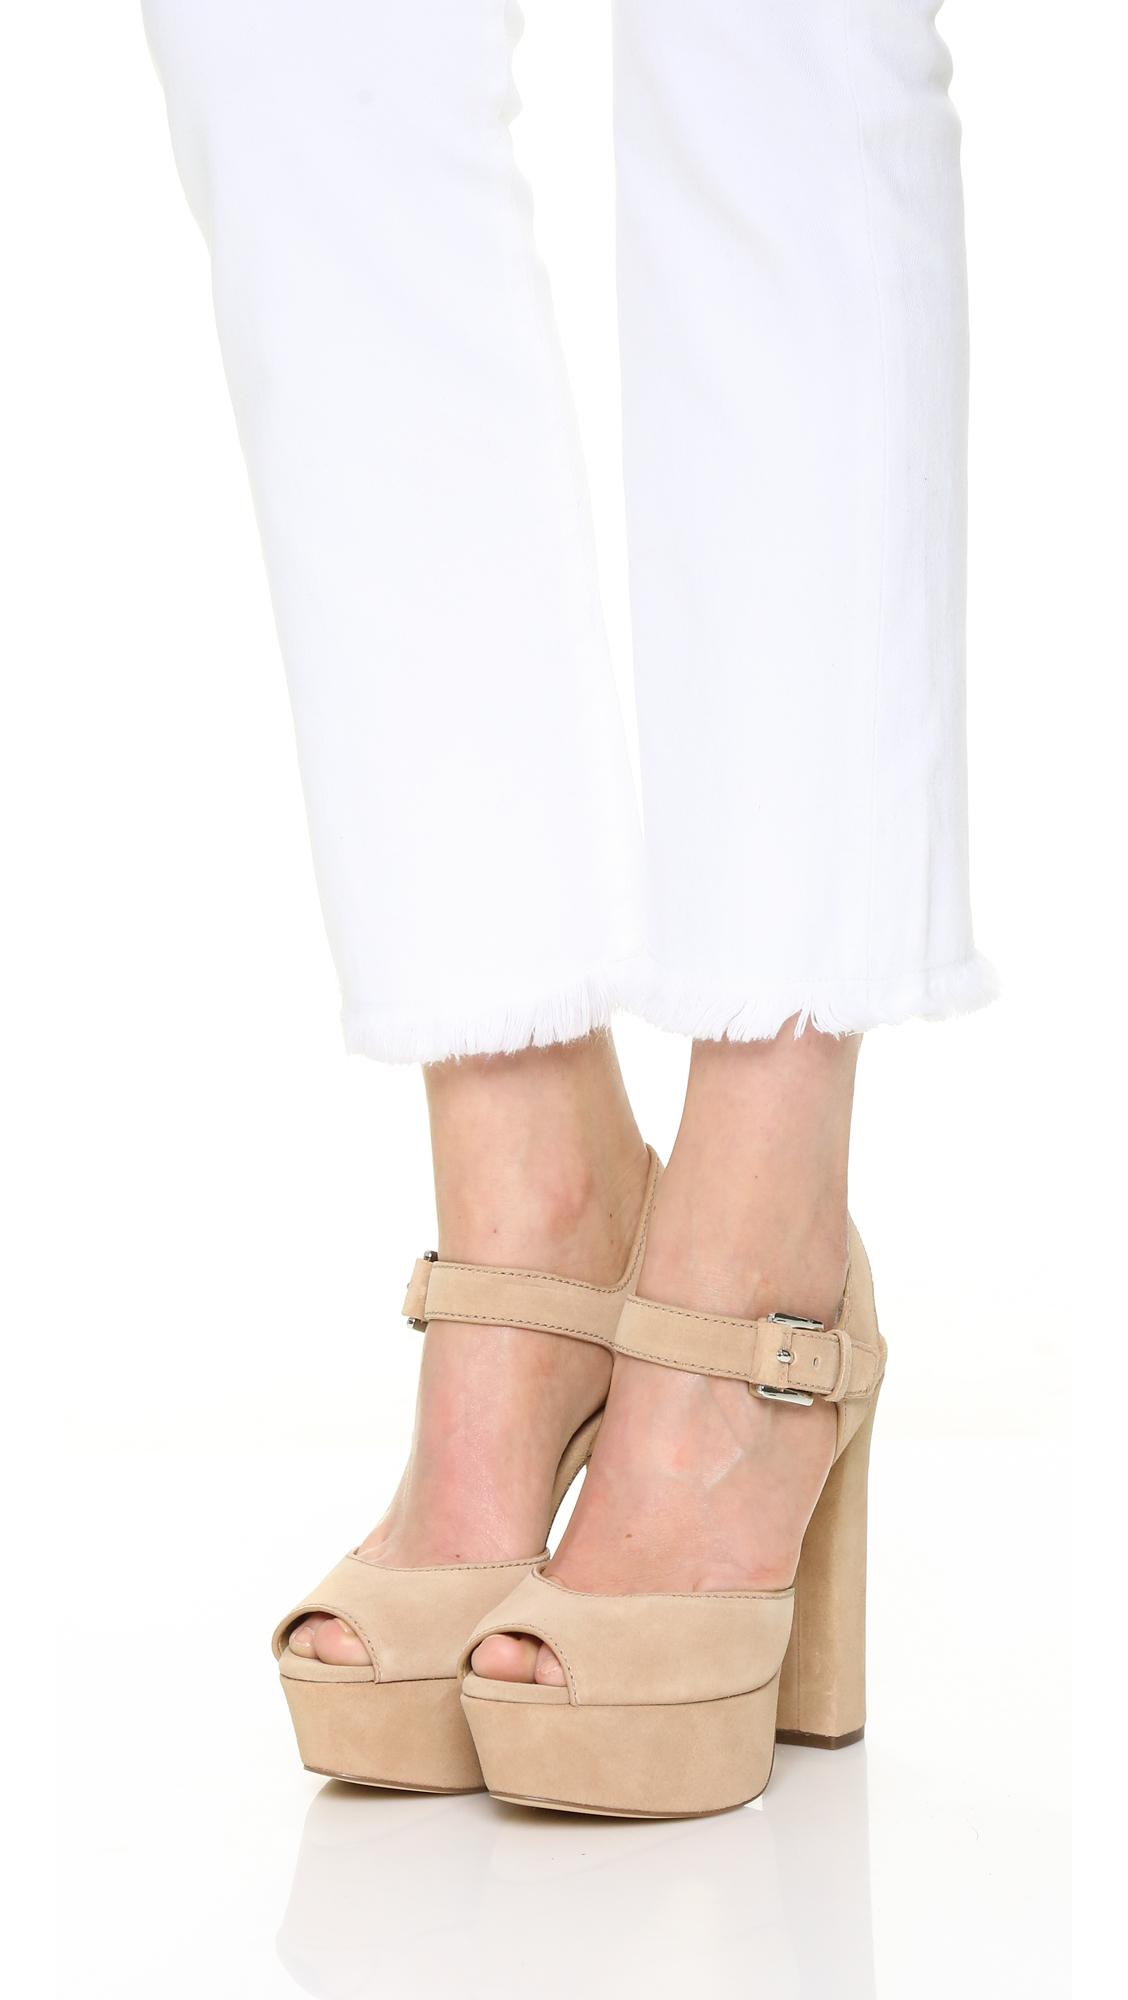 3555b7a29da7 Michael Michael Kors London Platform Sandals in Natural - Lyst